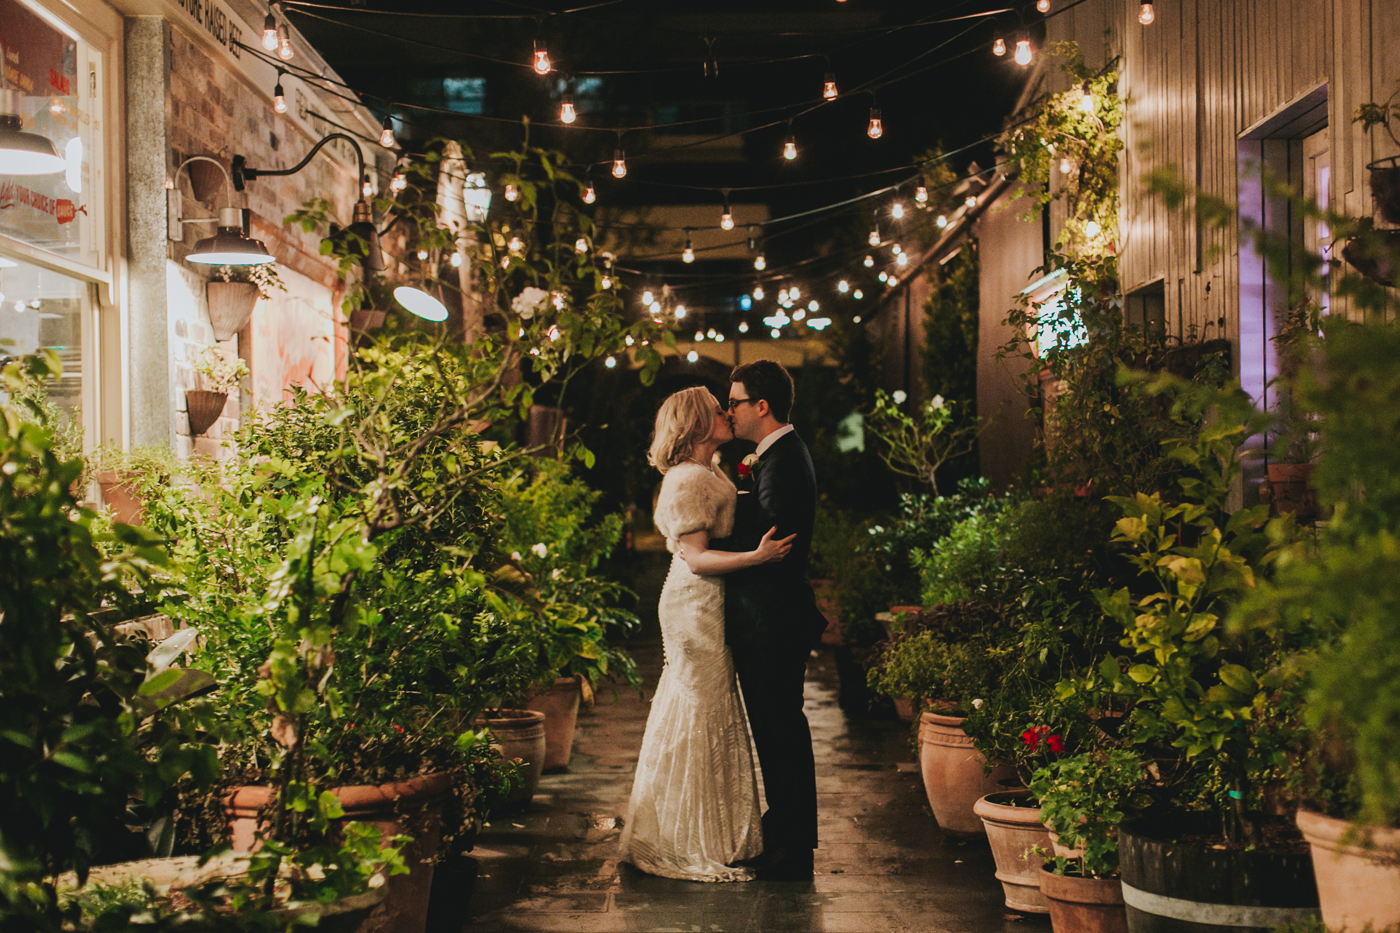 Jo & Tom Wedding - The Grounds of Alexandria - Samantha Heather Photography-321.jpg